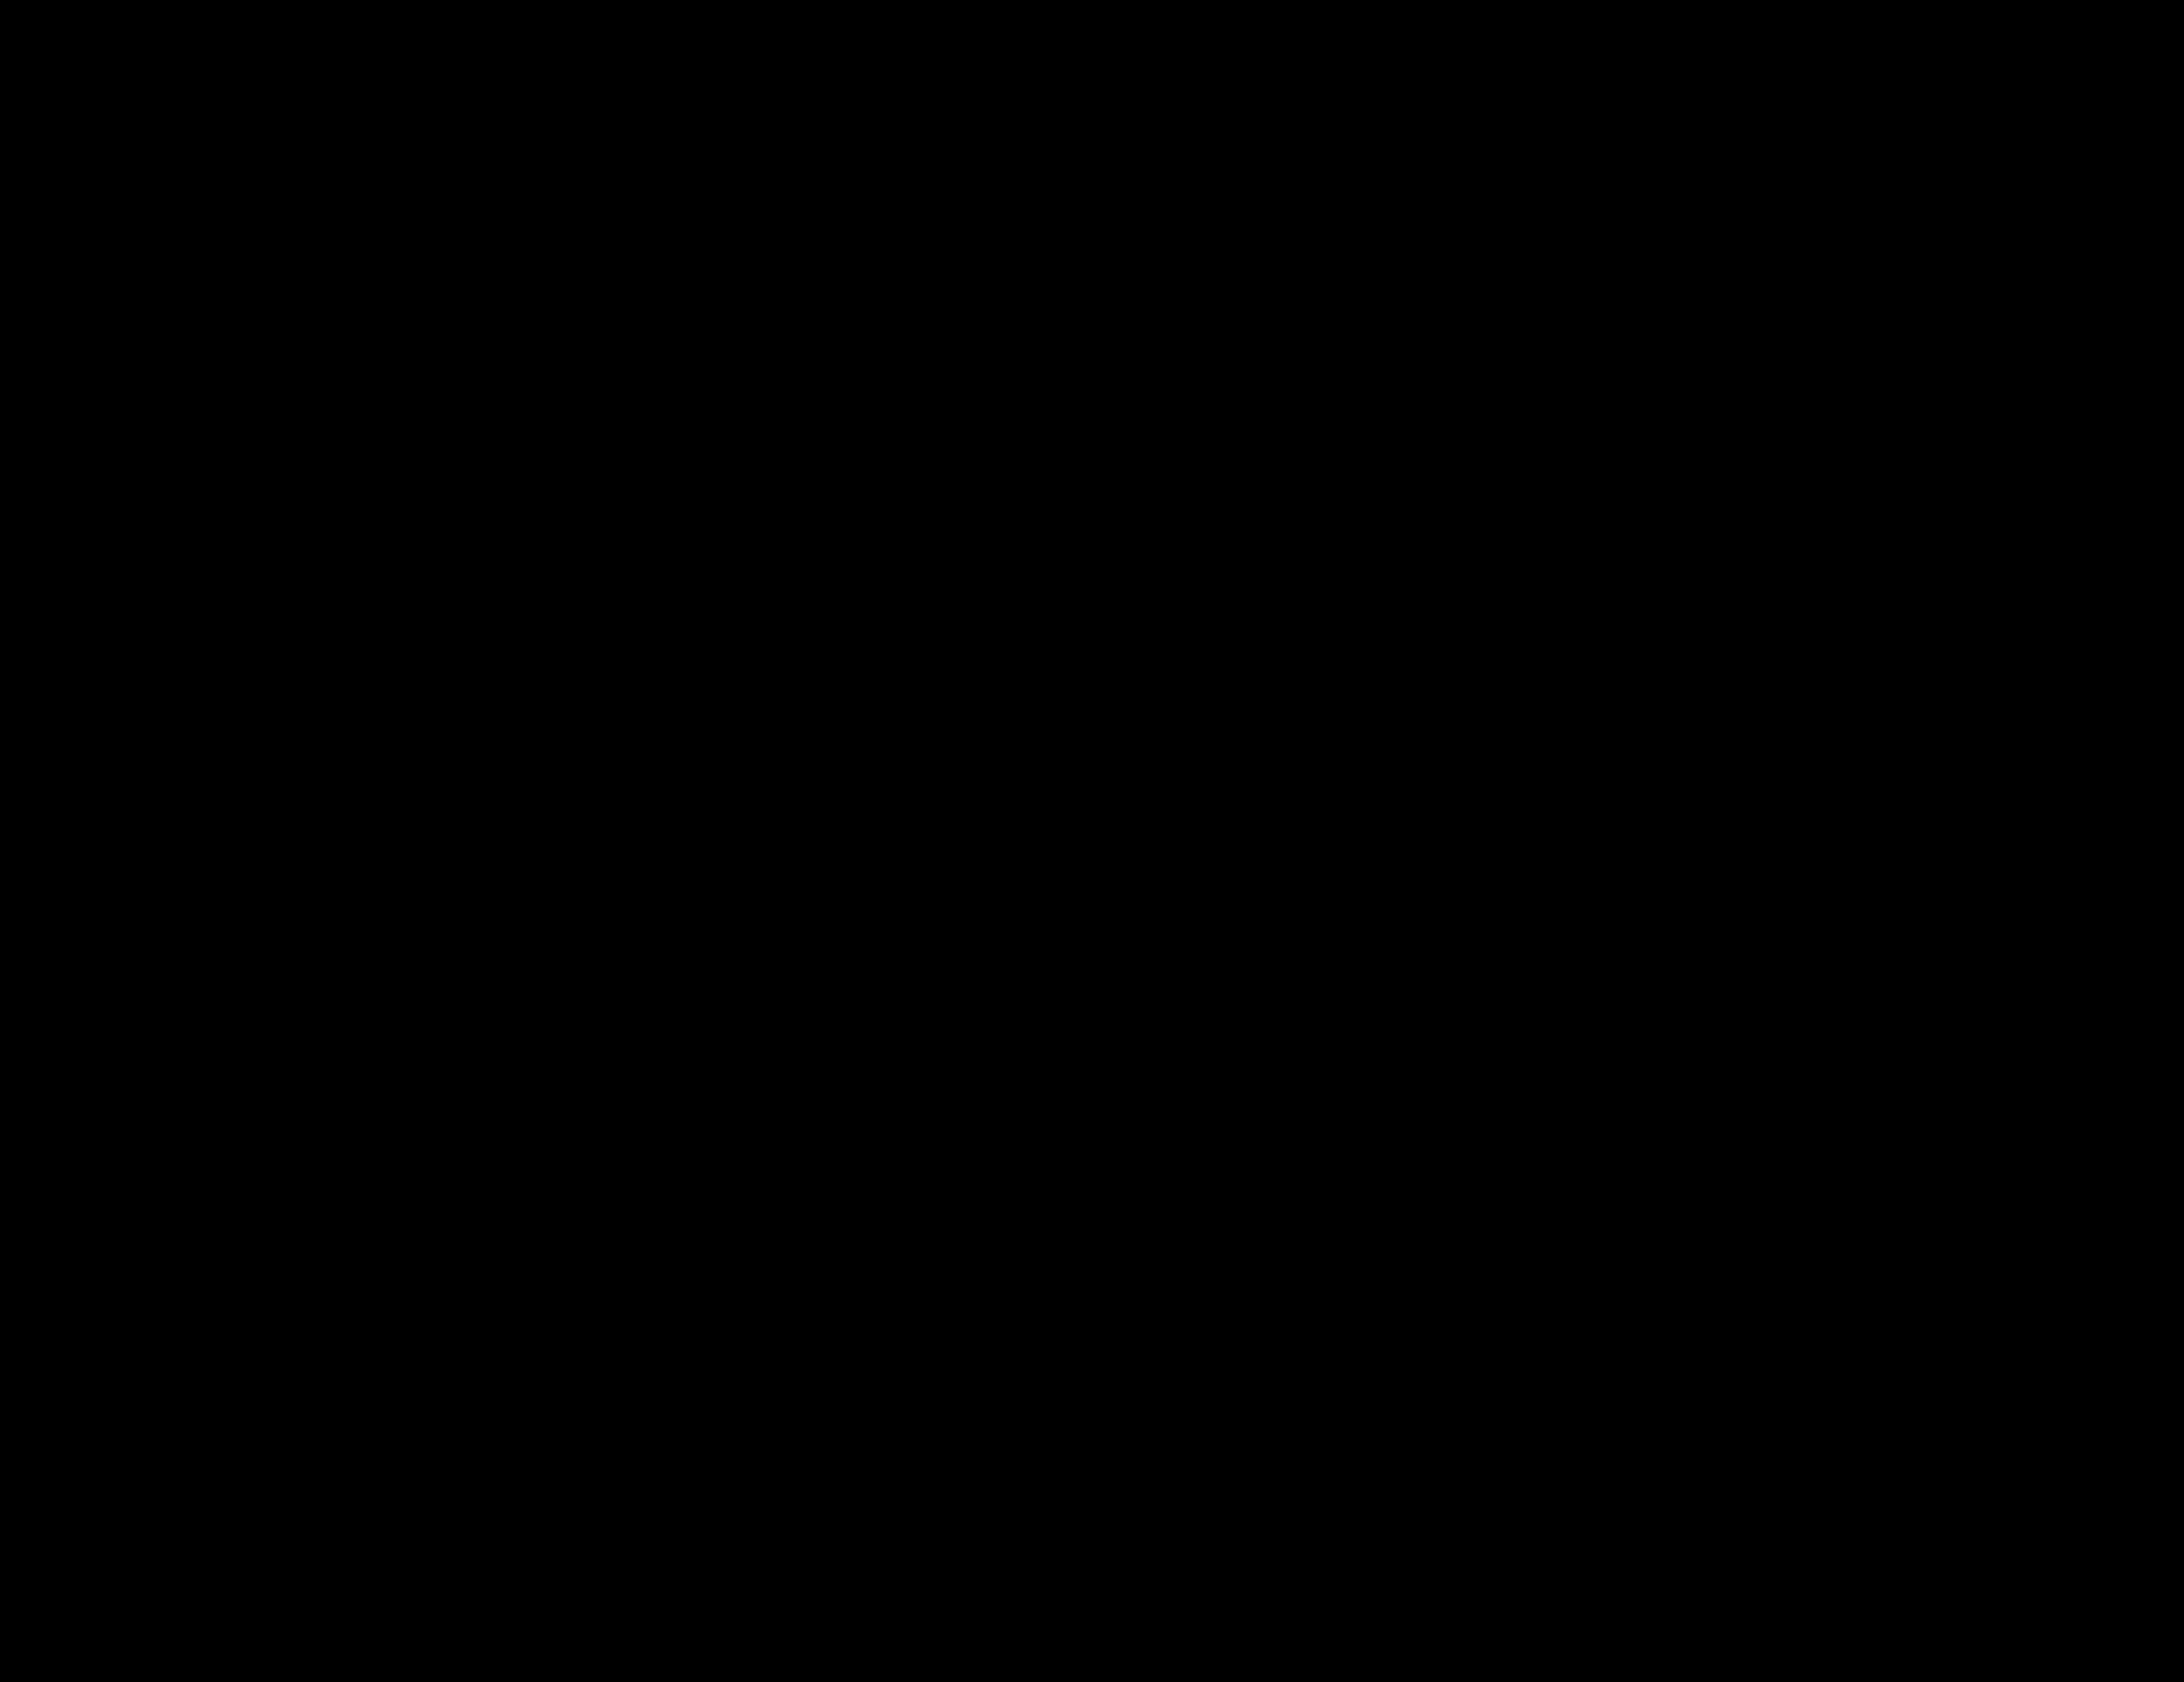 Camera Clipart-Camera Clipart-8